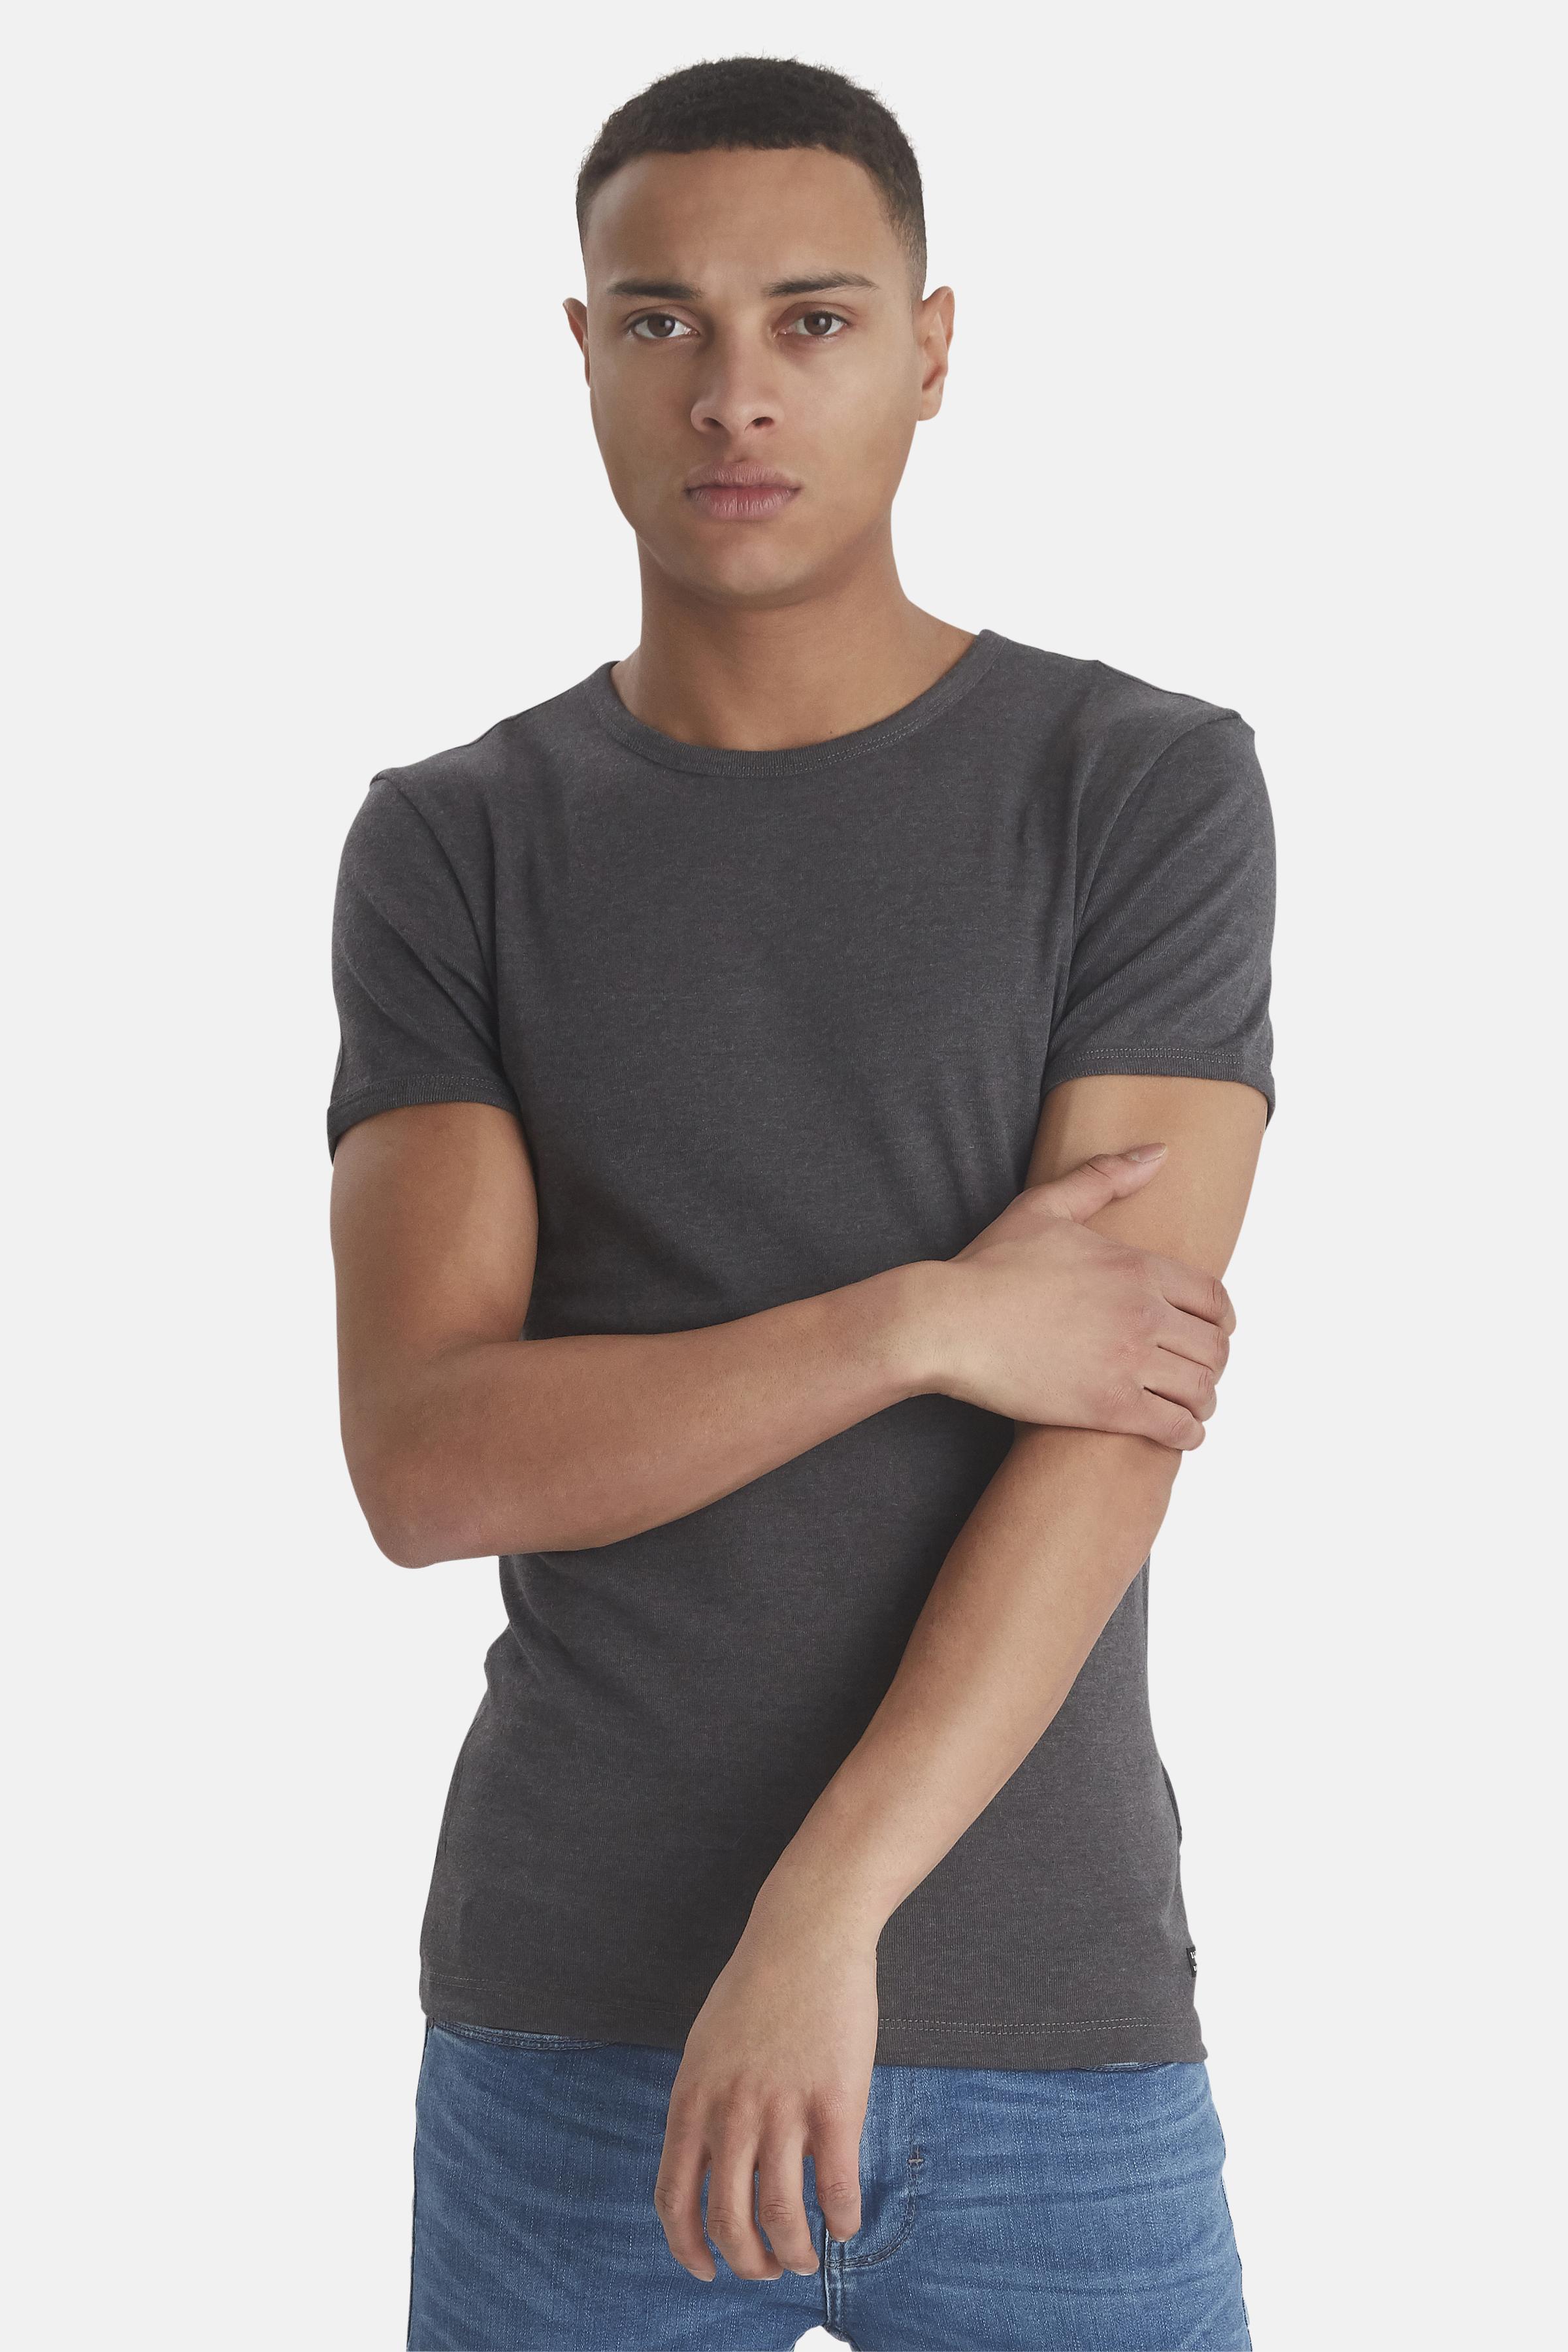 Charcoal T-shirt – Køb Charcoal T-shirt fra str. S-3XL her